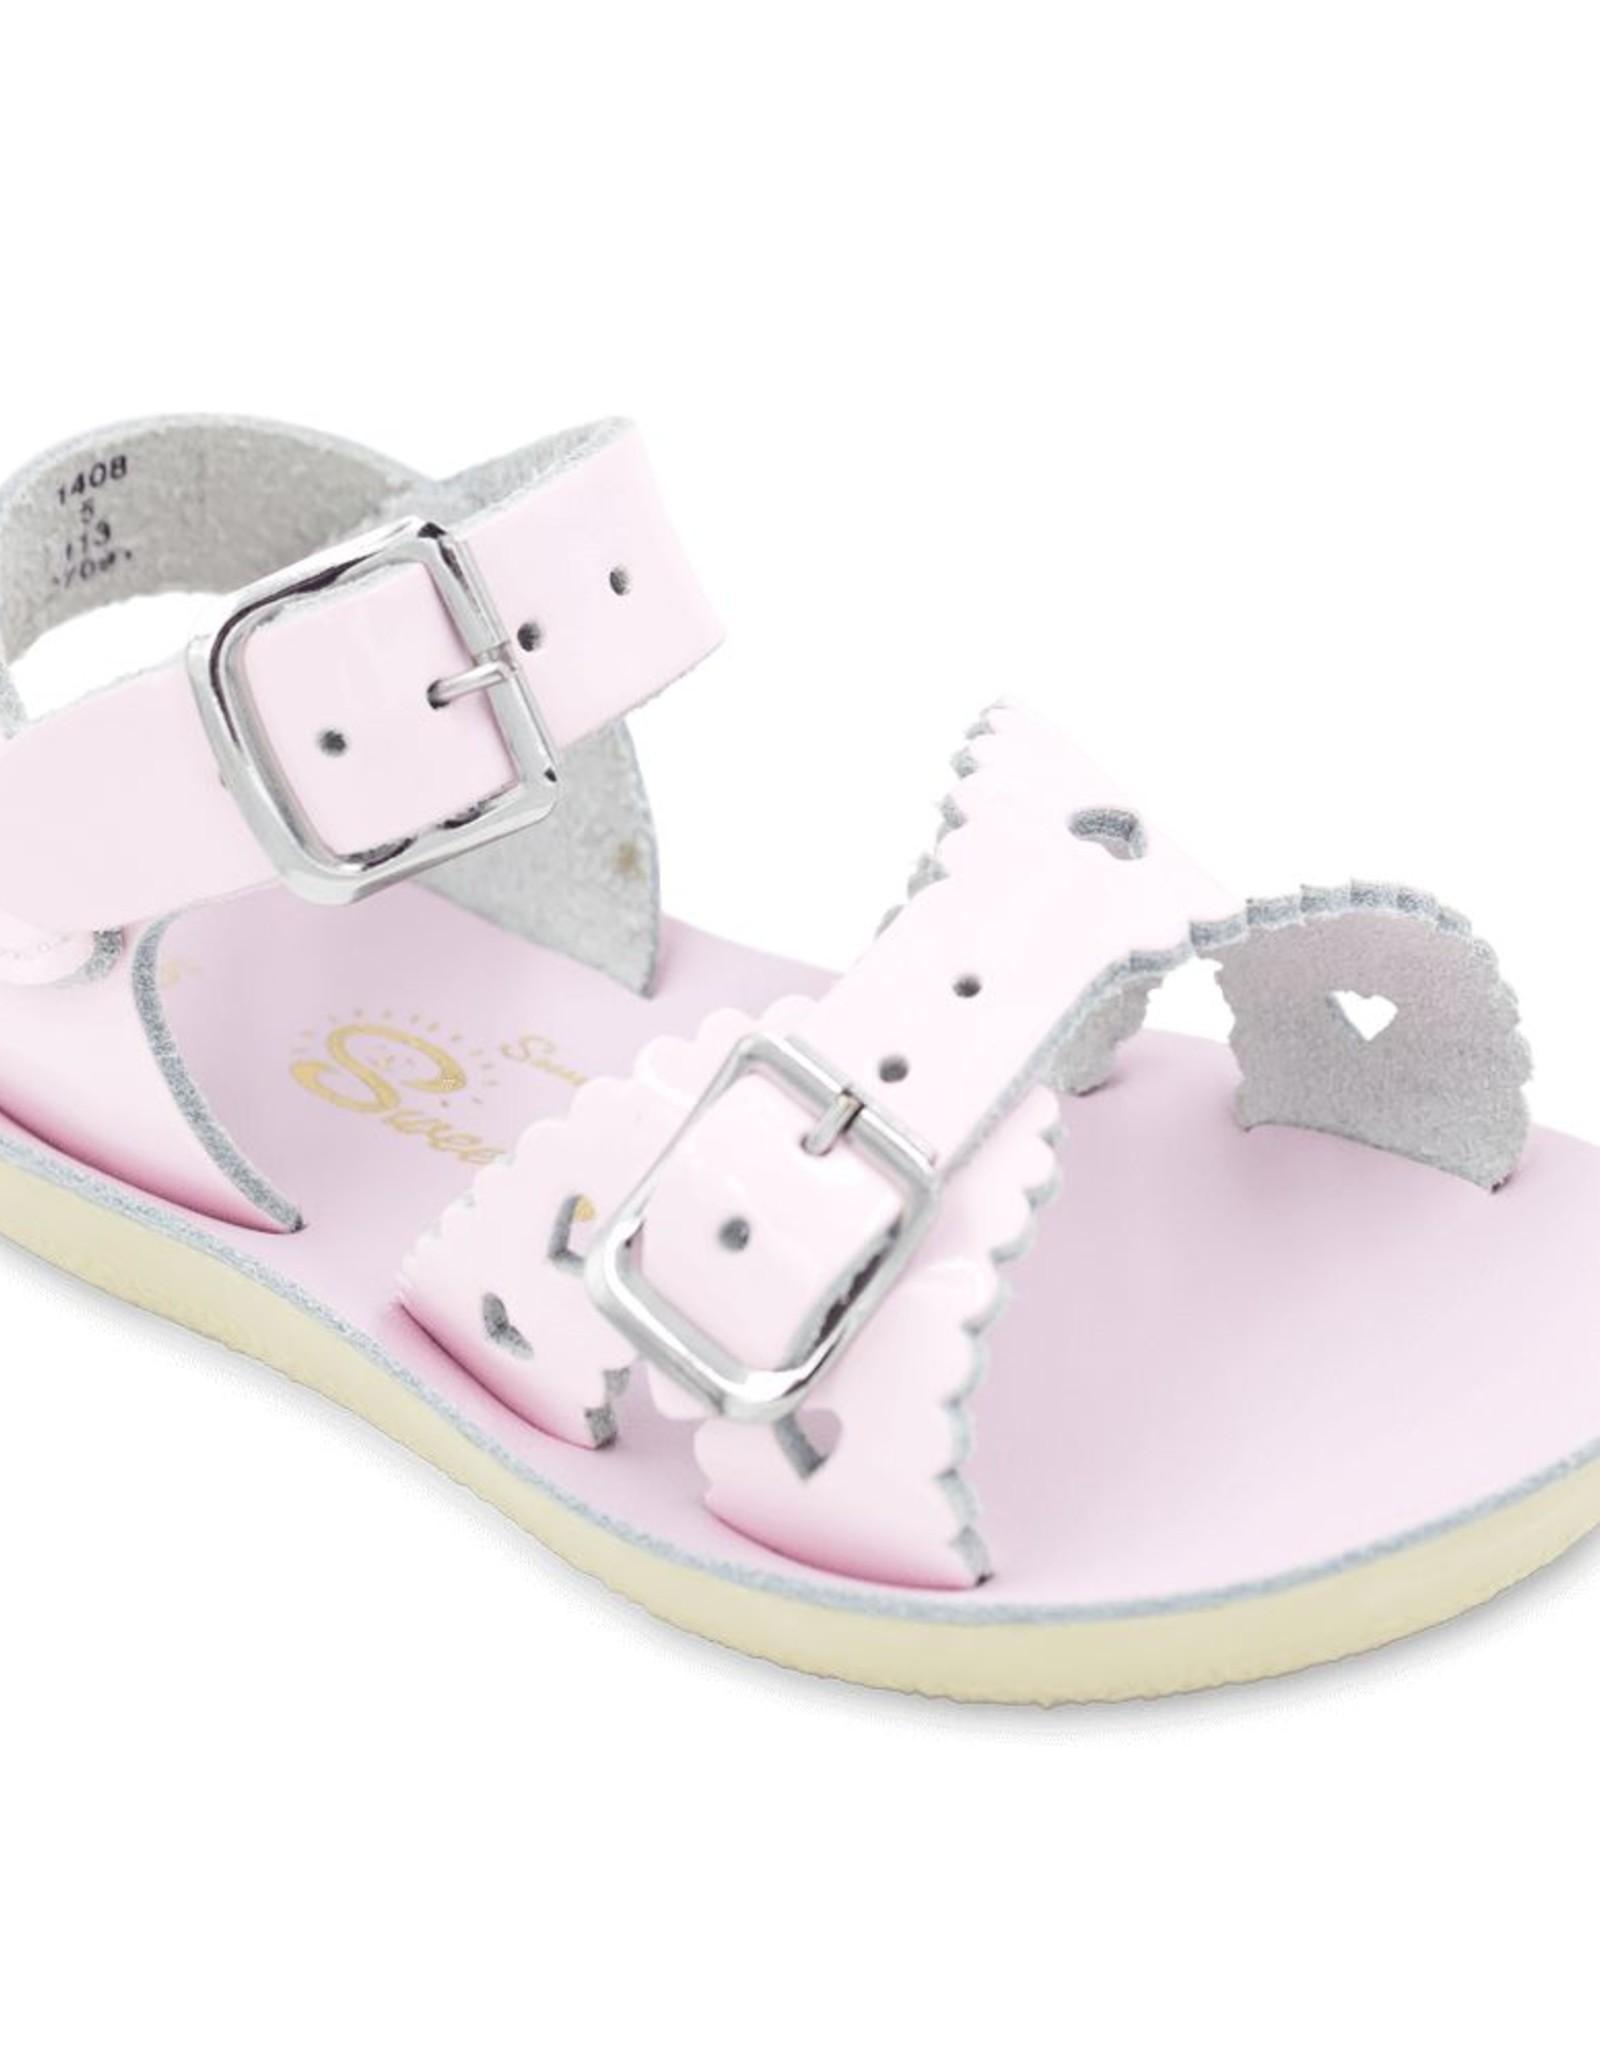 SunSan Pink Sweetheart Sandals